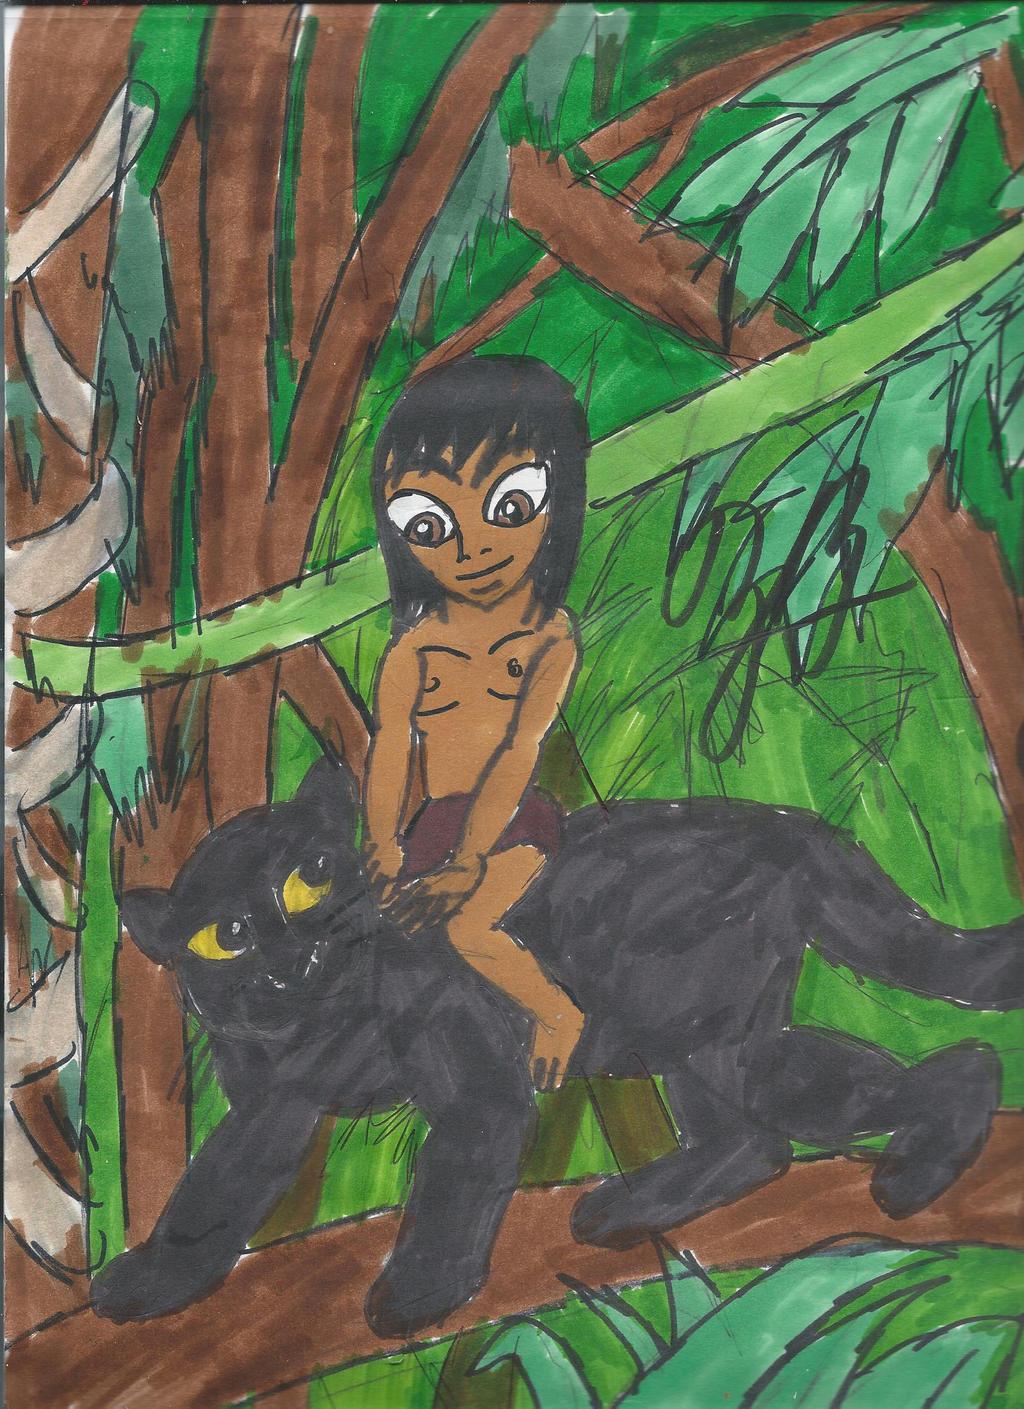 Mowgli And Bagheera Mowgli and bagheera by gorokai